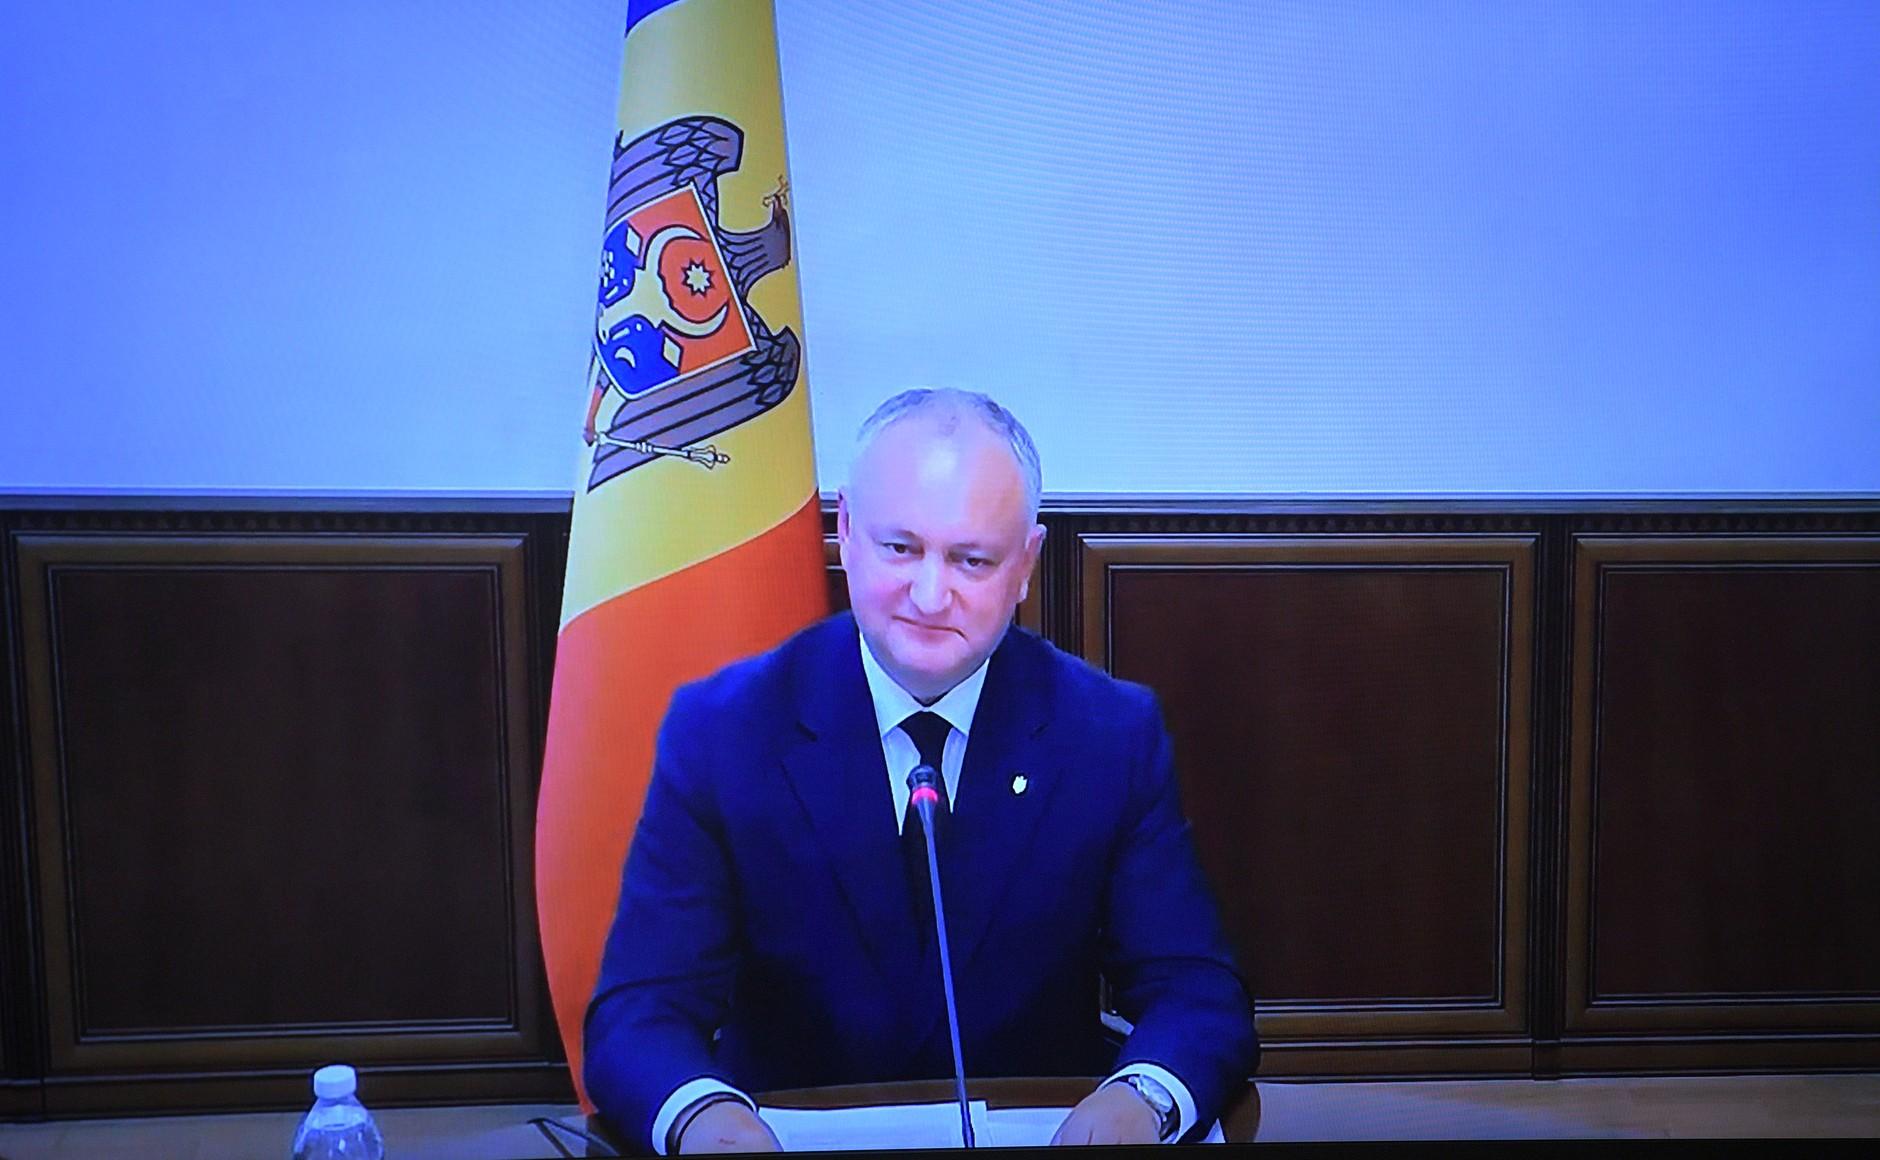 KREMLIN MOLDAVIE PH 3 X 5 DU 28.09.2020 Rencontre avec le président de la Moldavie Igor Dodon (par vidéoconférence). kEqTRoIVE54moAb7QStkWVtsWxFyPi1u